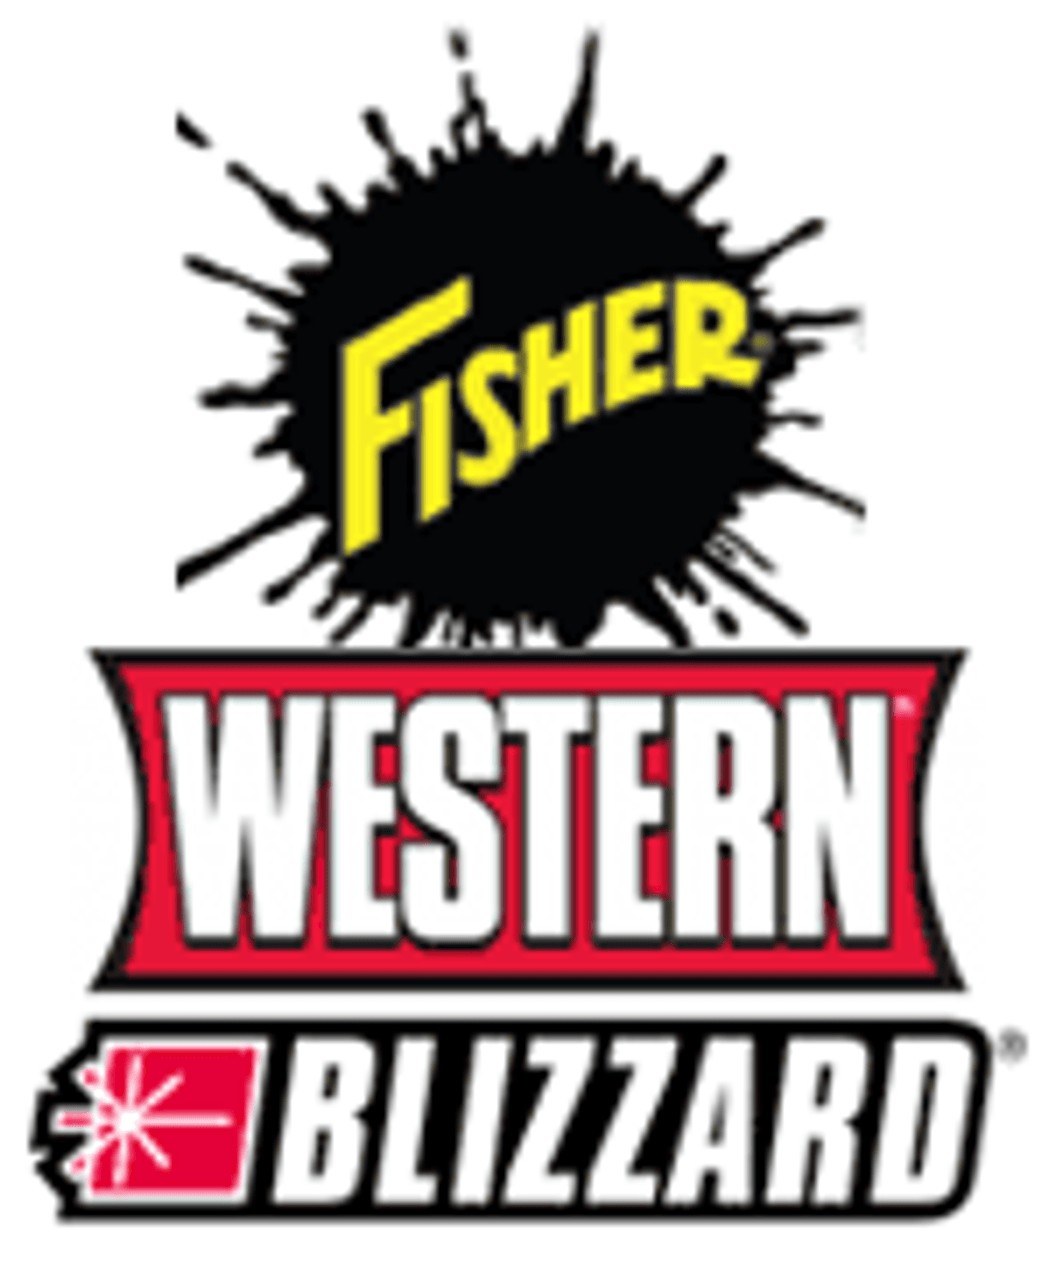 26357 - FISHER - WESTERN - BLIZZARD - SNOWEX  OEM VEHICLE LIGHTING HARNESS 11-PIN